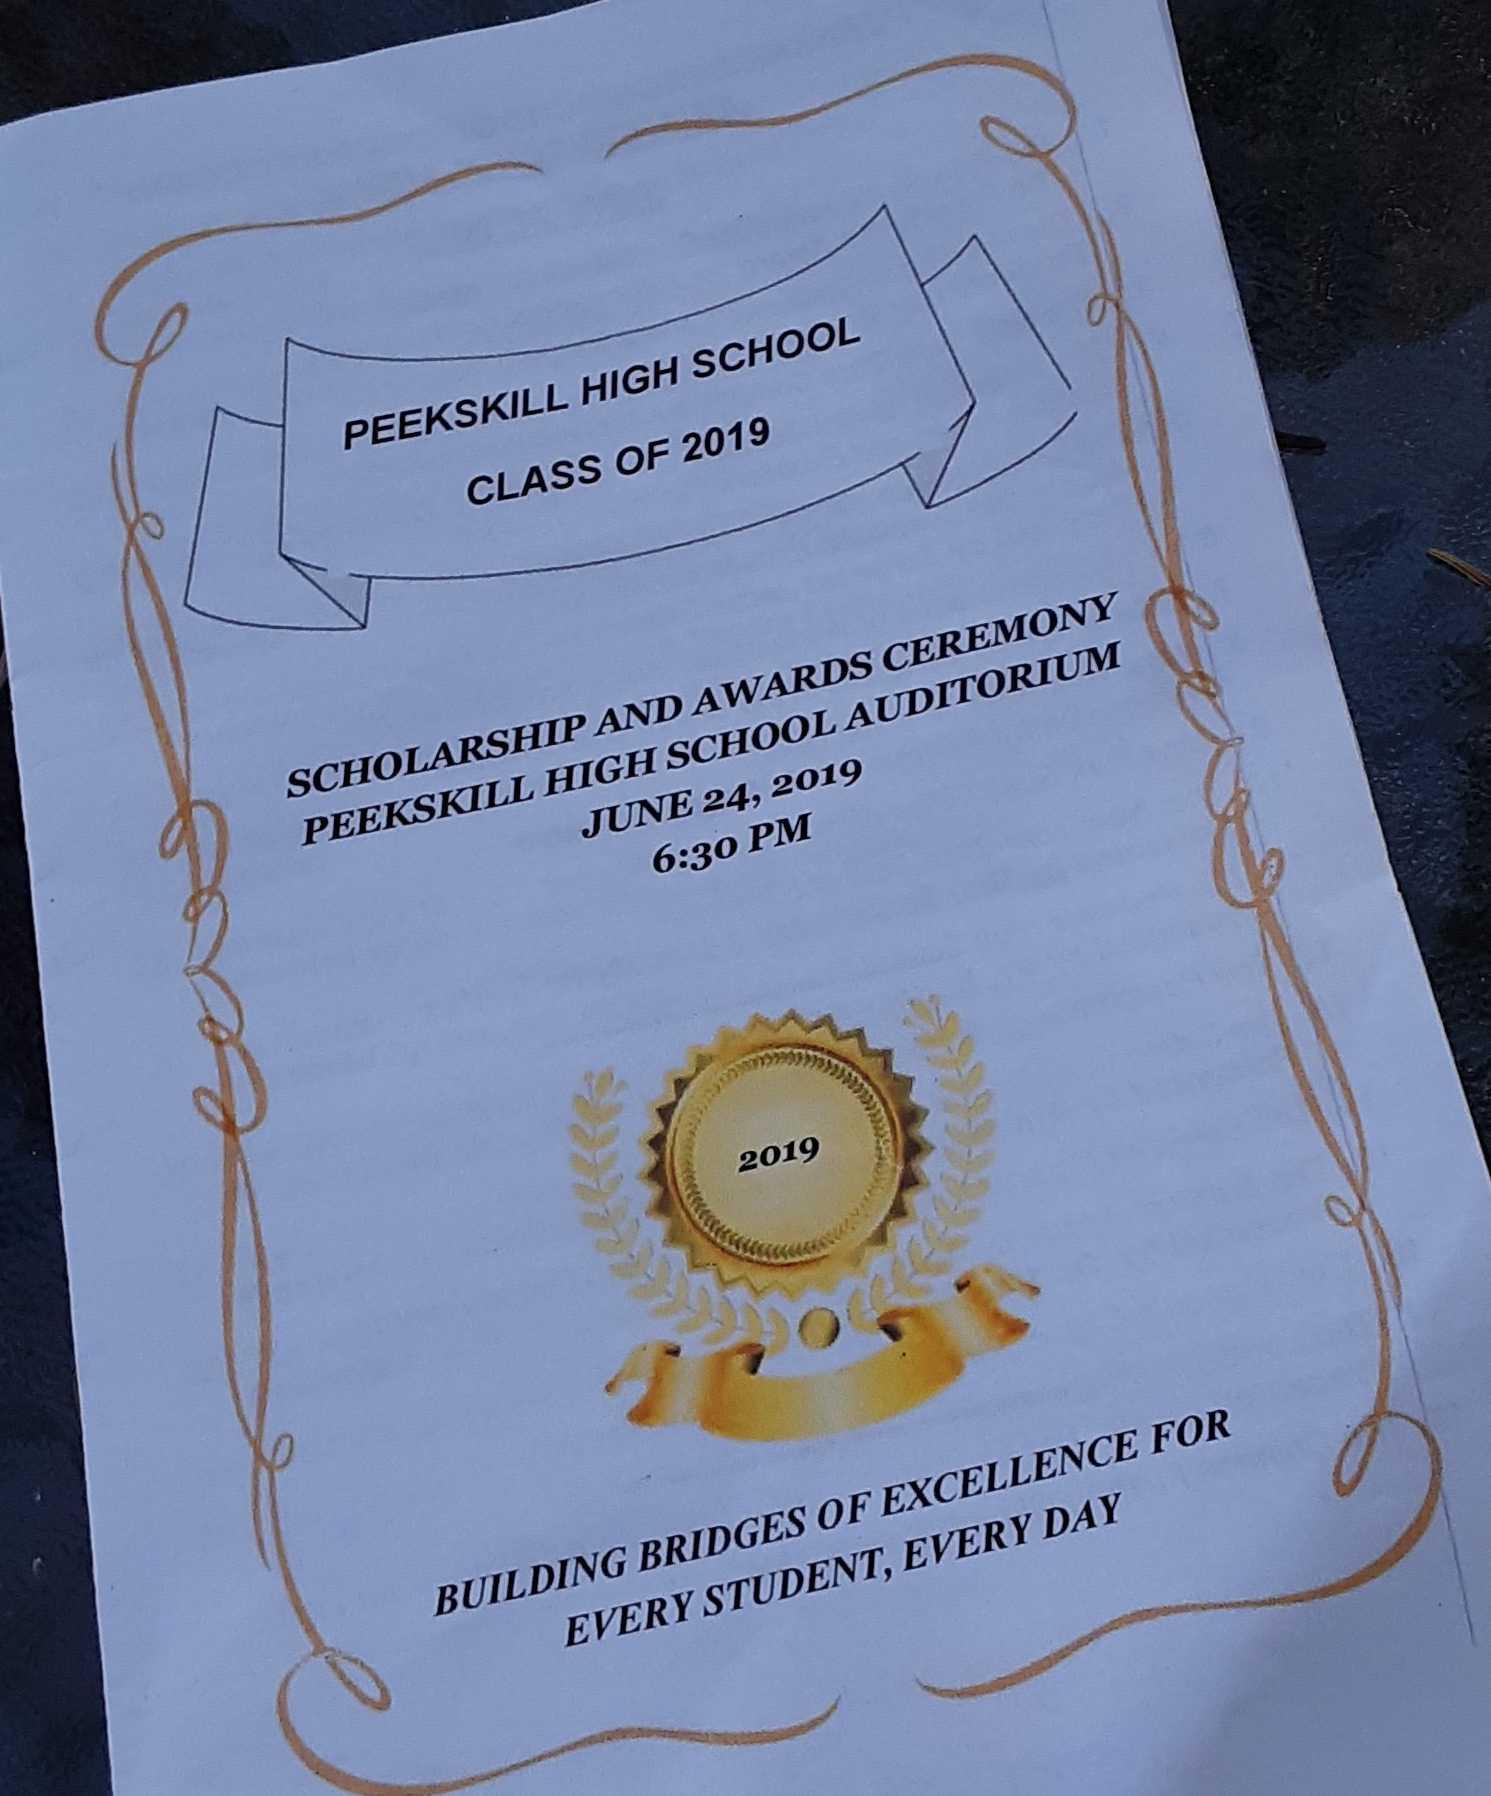 Award program